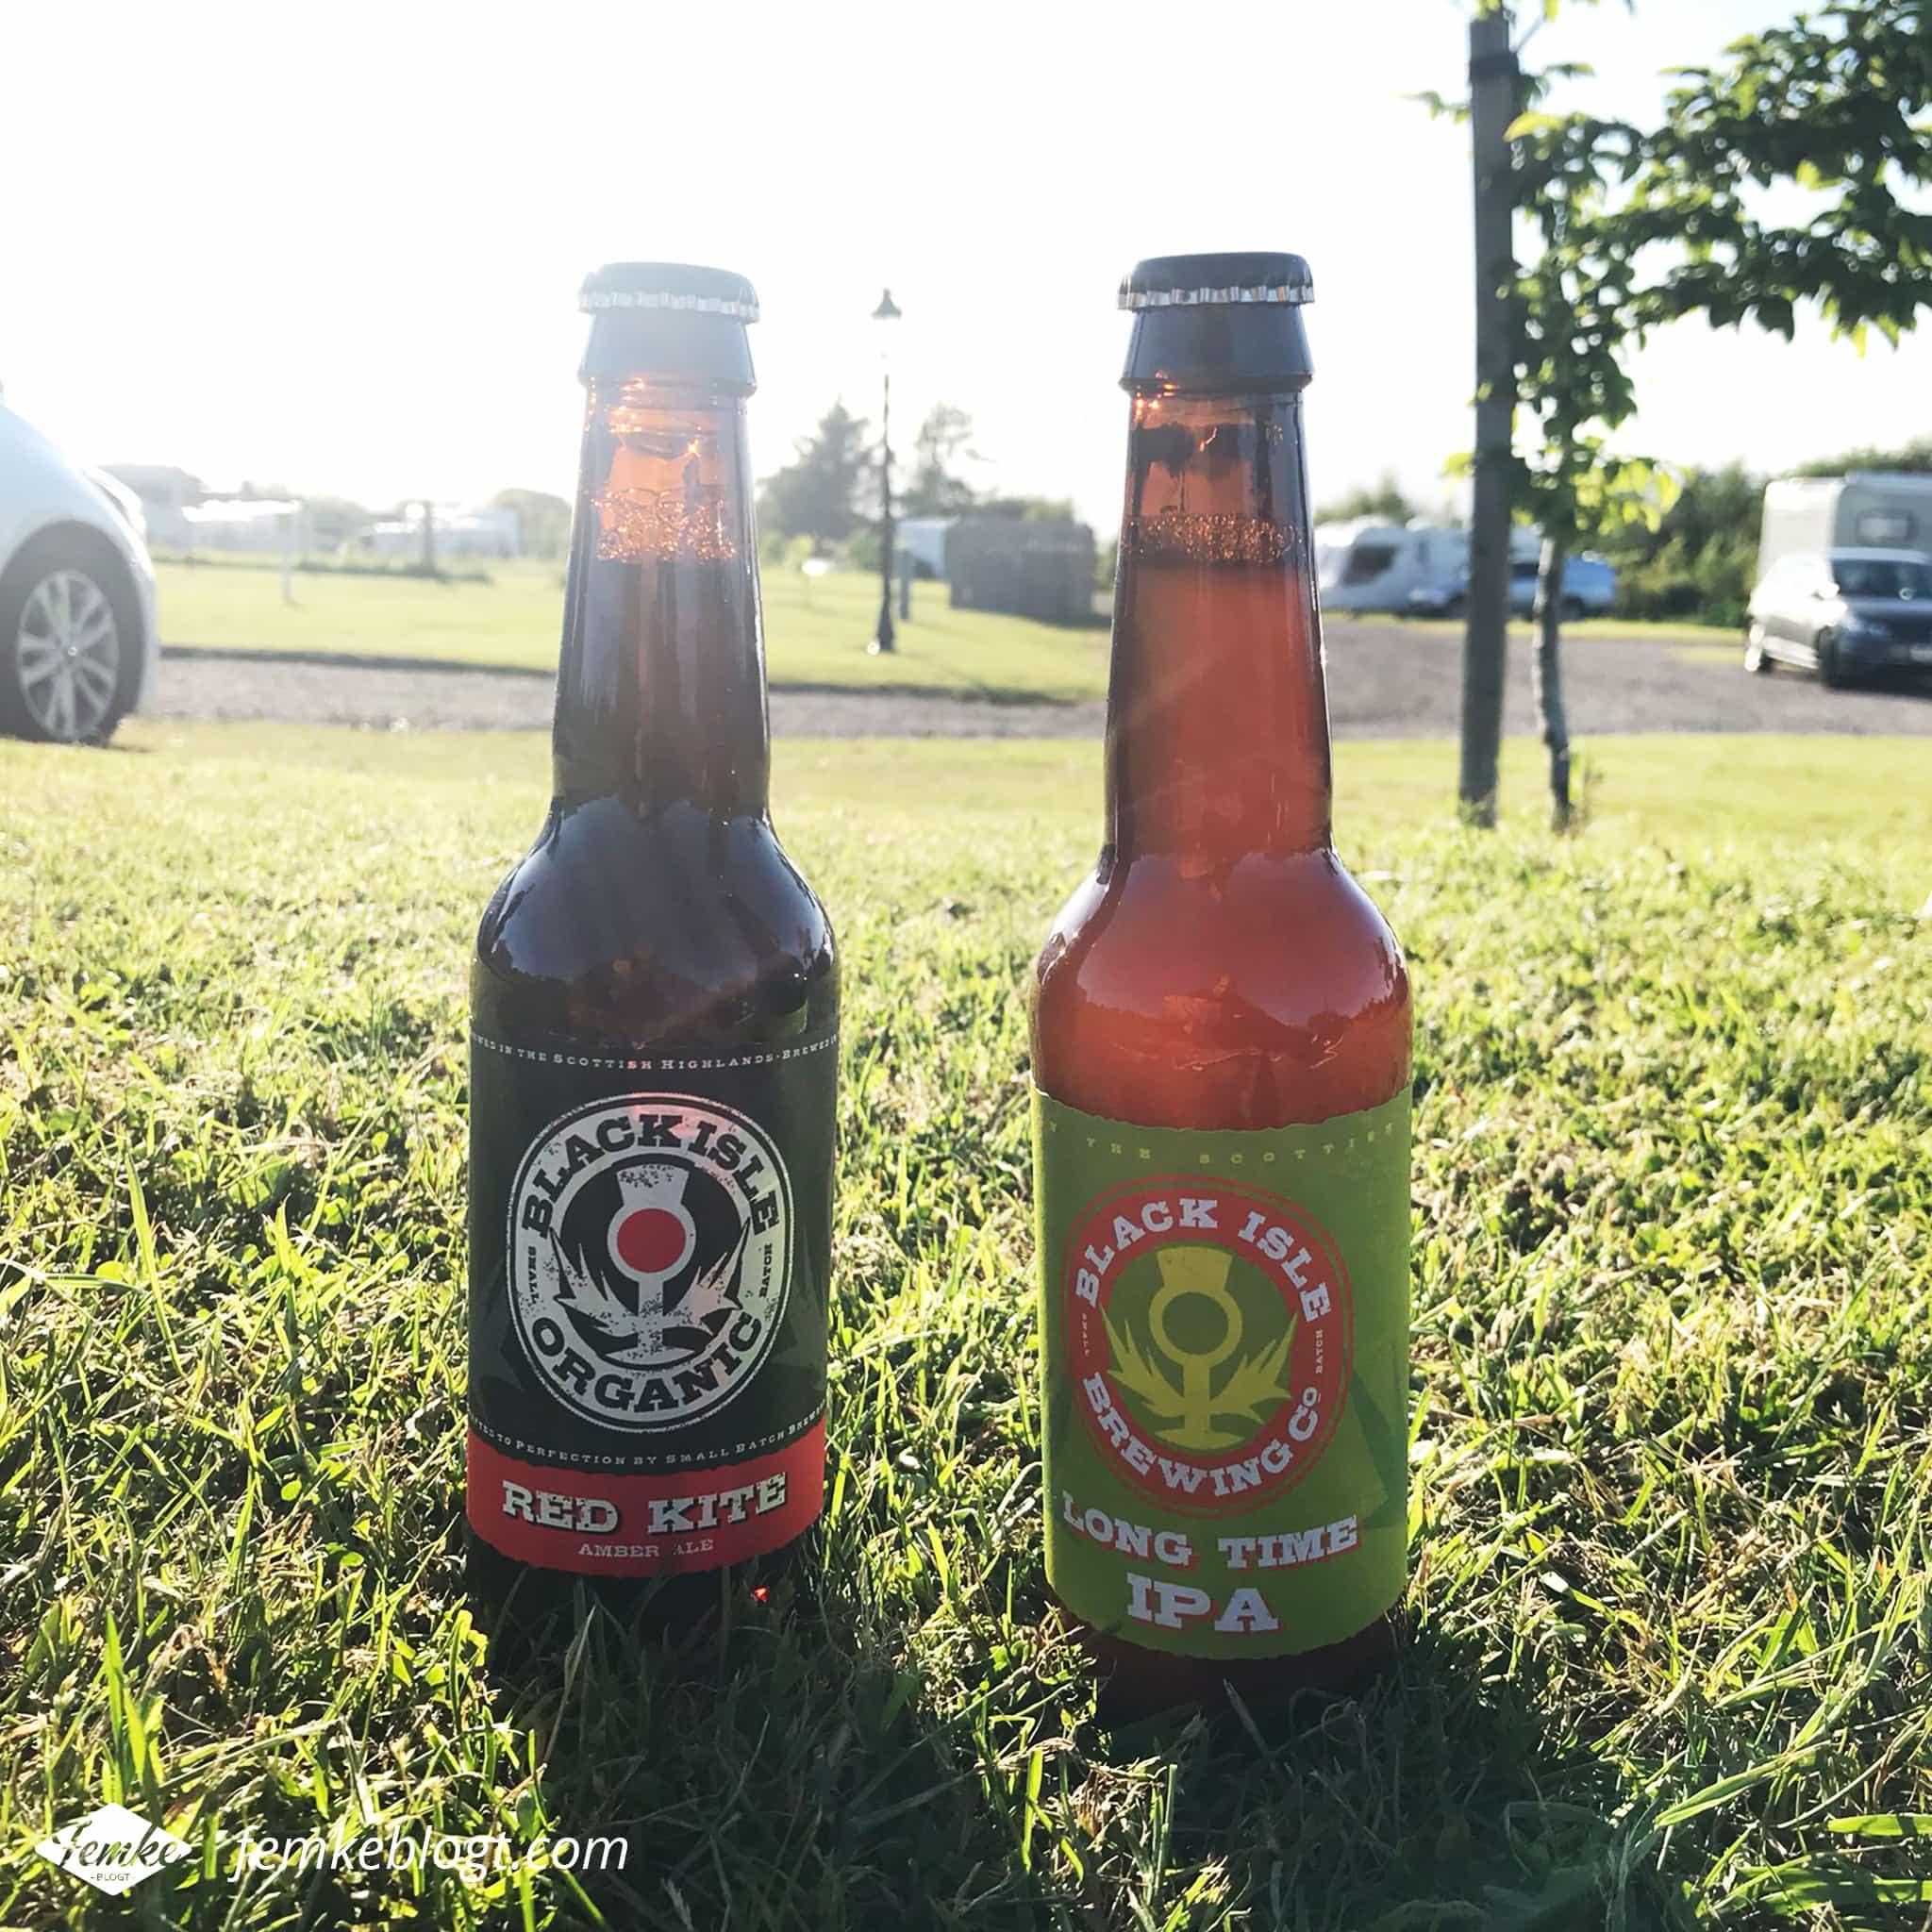 Maandoverzicht juni | Black Isle Brewery